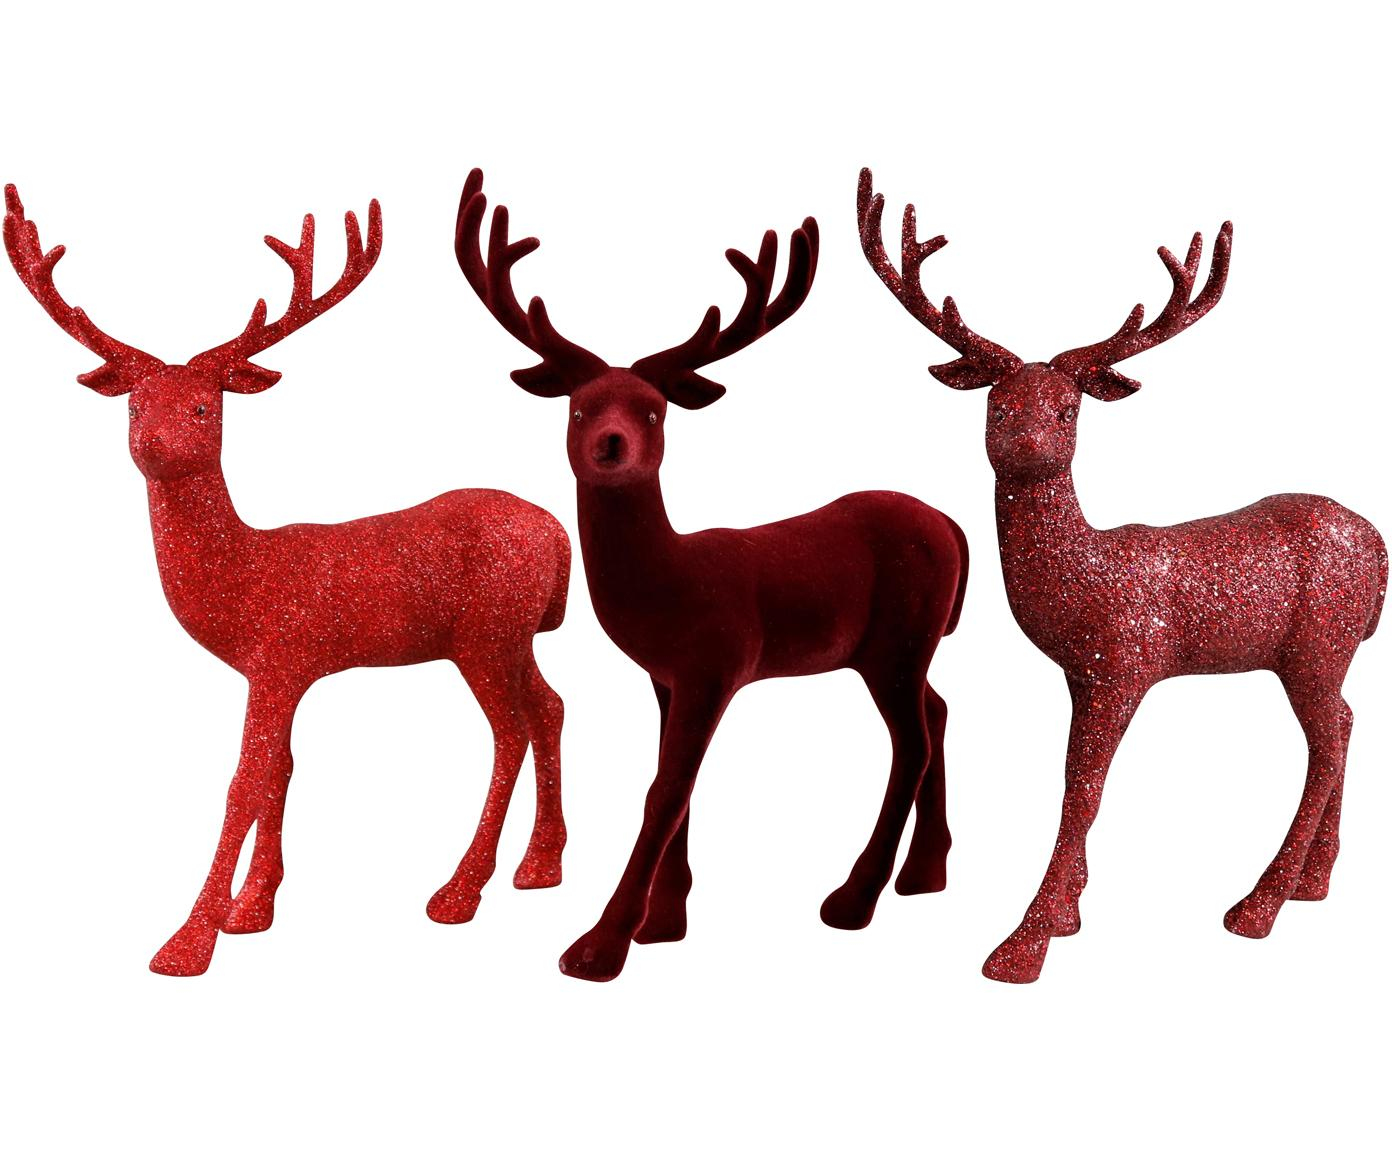 Set de figuras decorativas Splendid, 3pzas., Espuma de poliestireno, purpurina, Rojo, An 23 x Al 30 cm